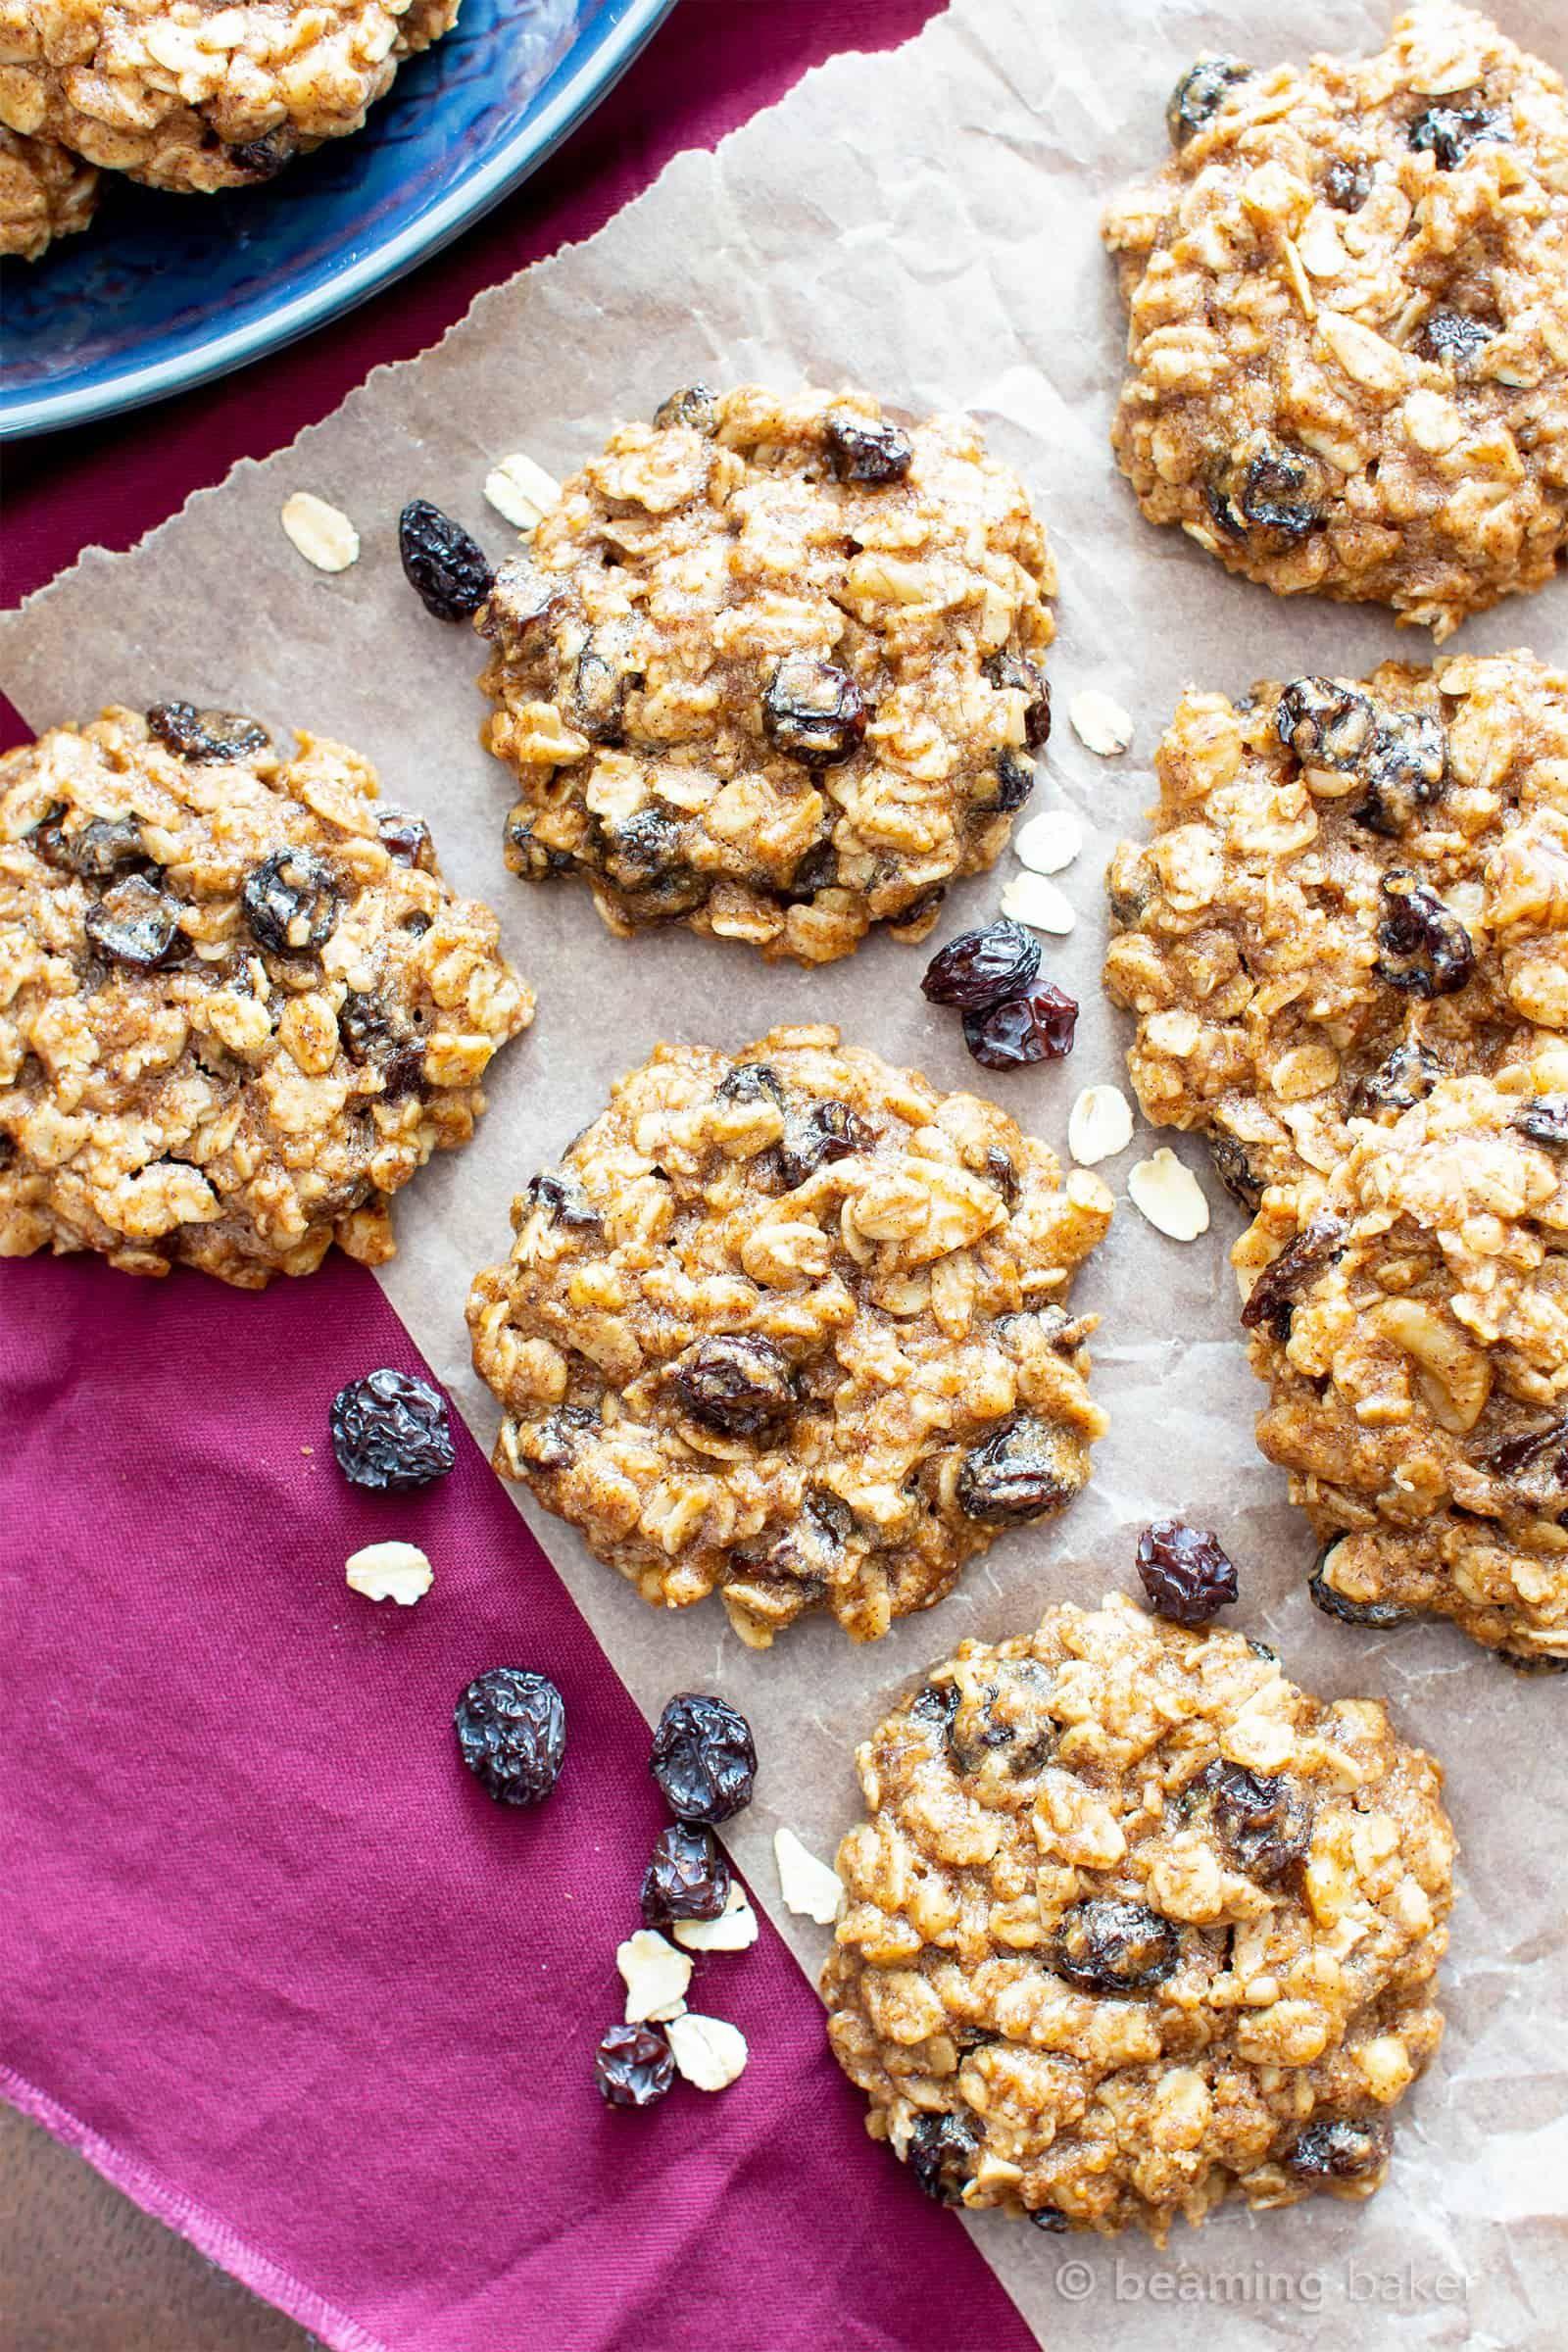 Chewy oatmeal raisin cookie recipe v gf my favorite